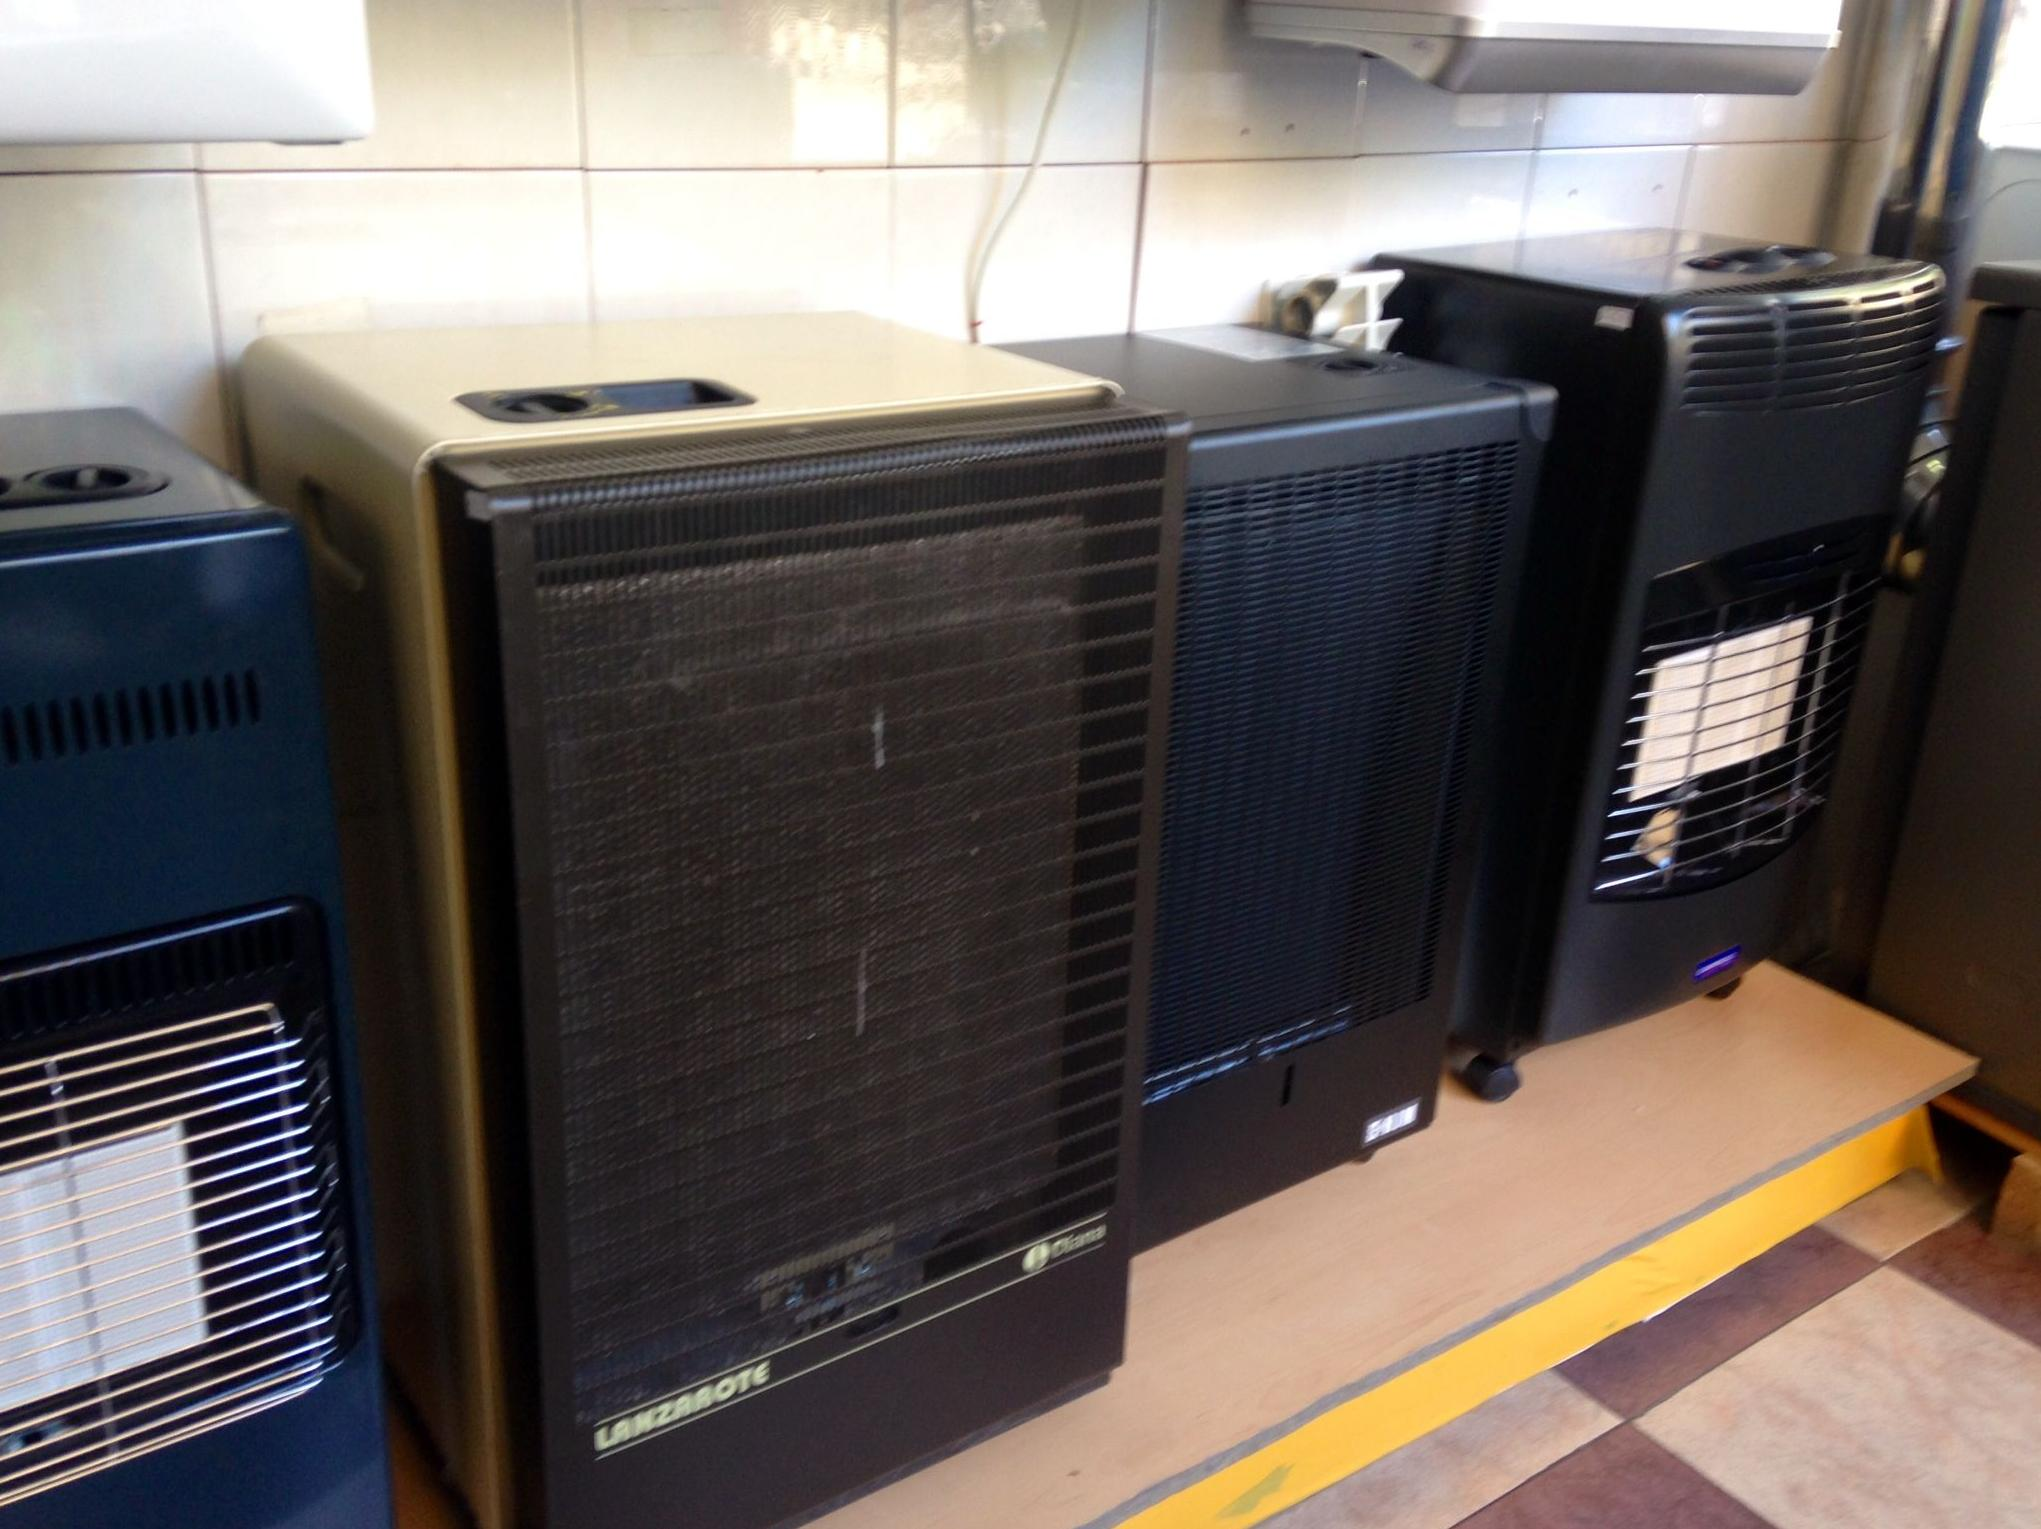 Exposición de estufas